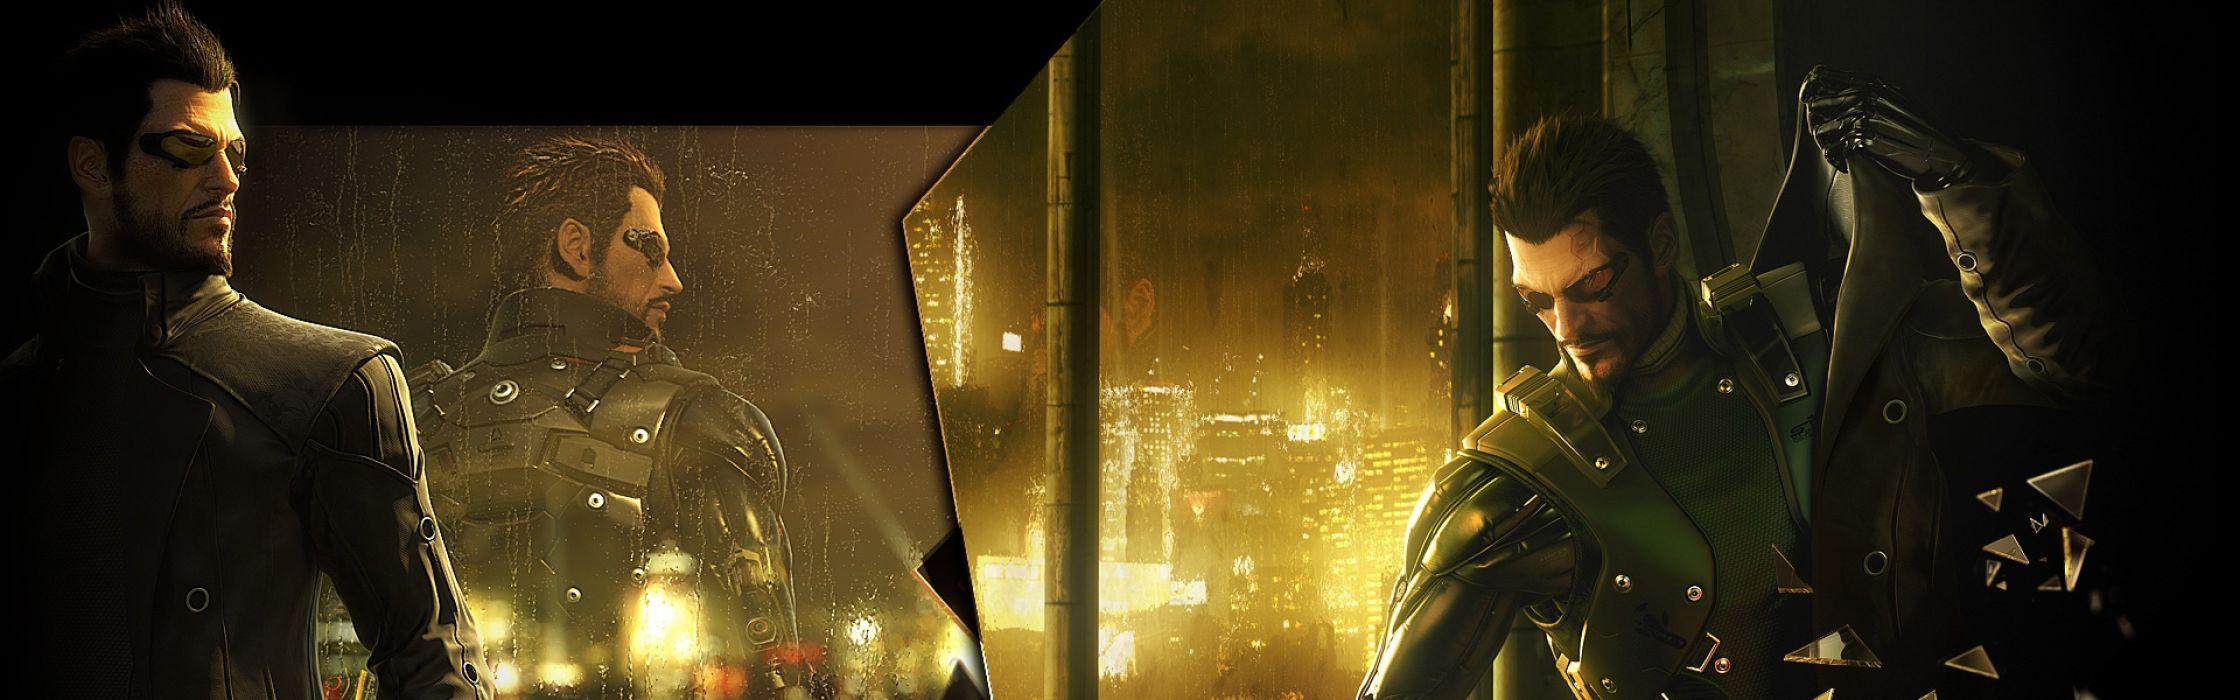 DEUS EX Human Revolution cyberpunk action role playing sci-fi futuristic (82) wallpaper